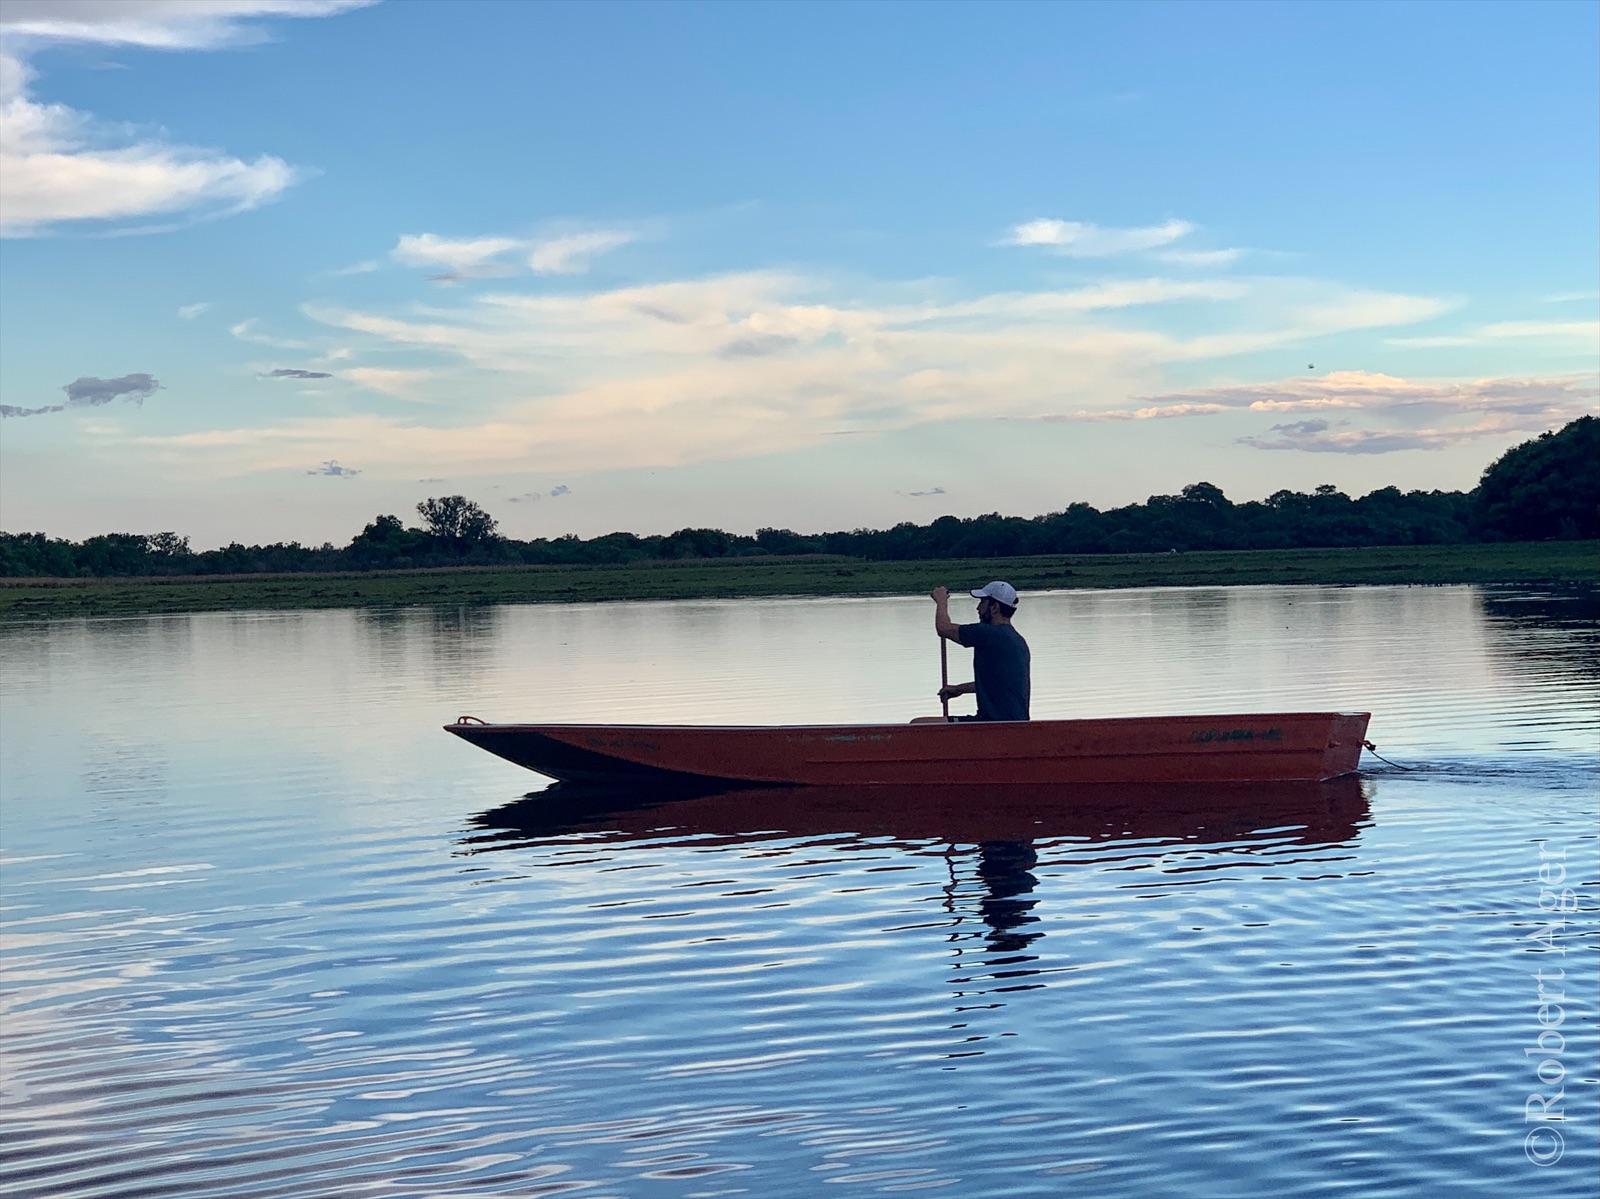 352_Overlander_Gaia_Pantanal